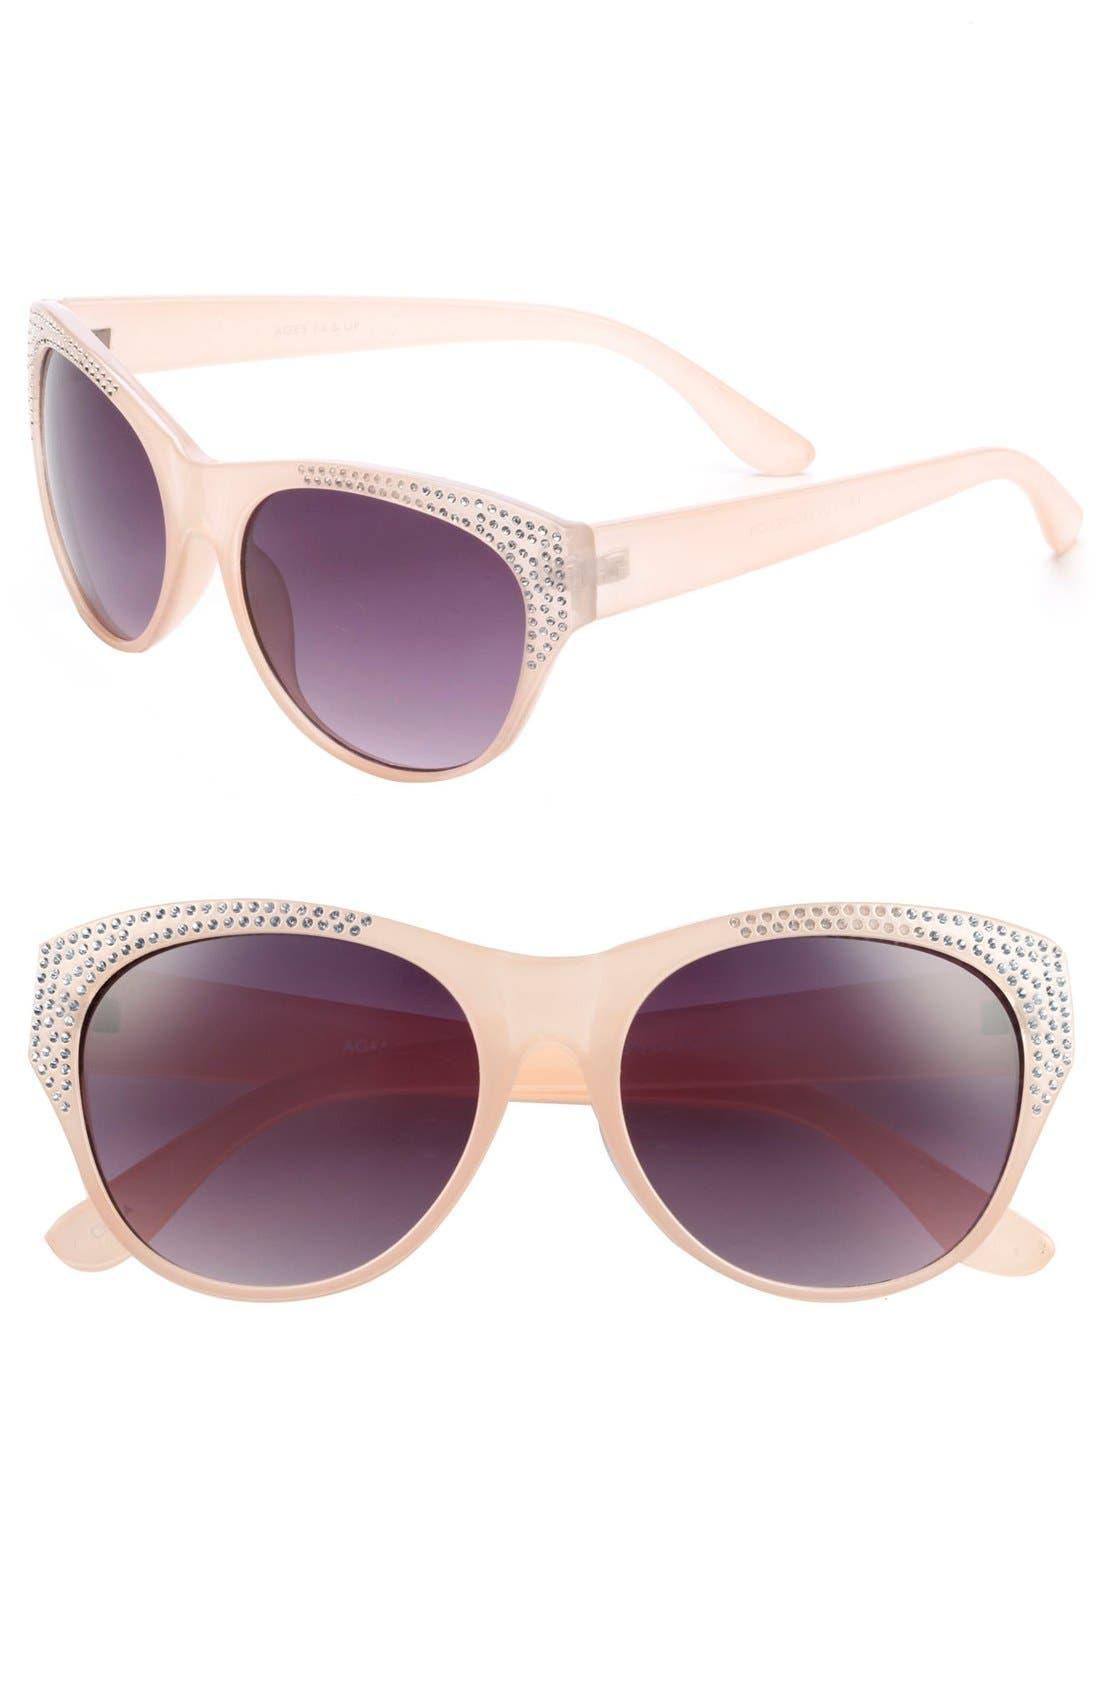 Alternate Image 1 Selected - Fantas Eyes Rhinestone Stud Sunglasses